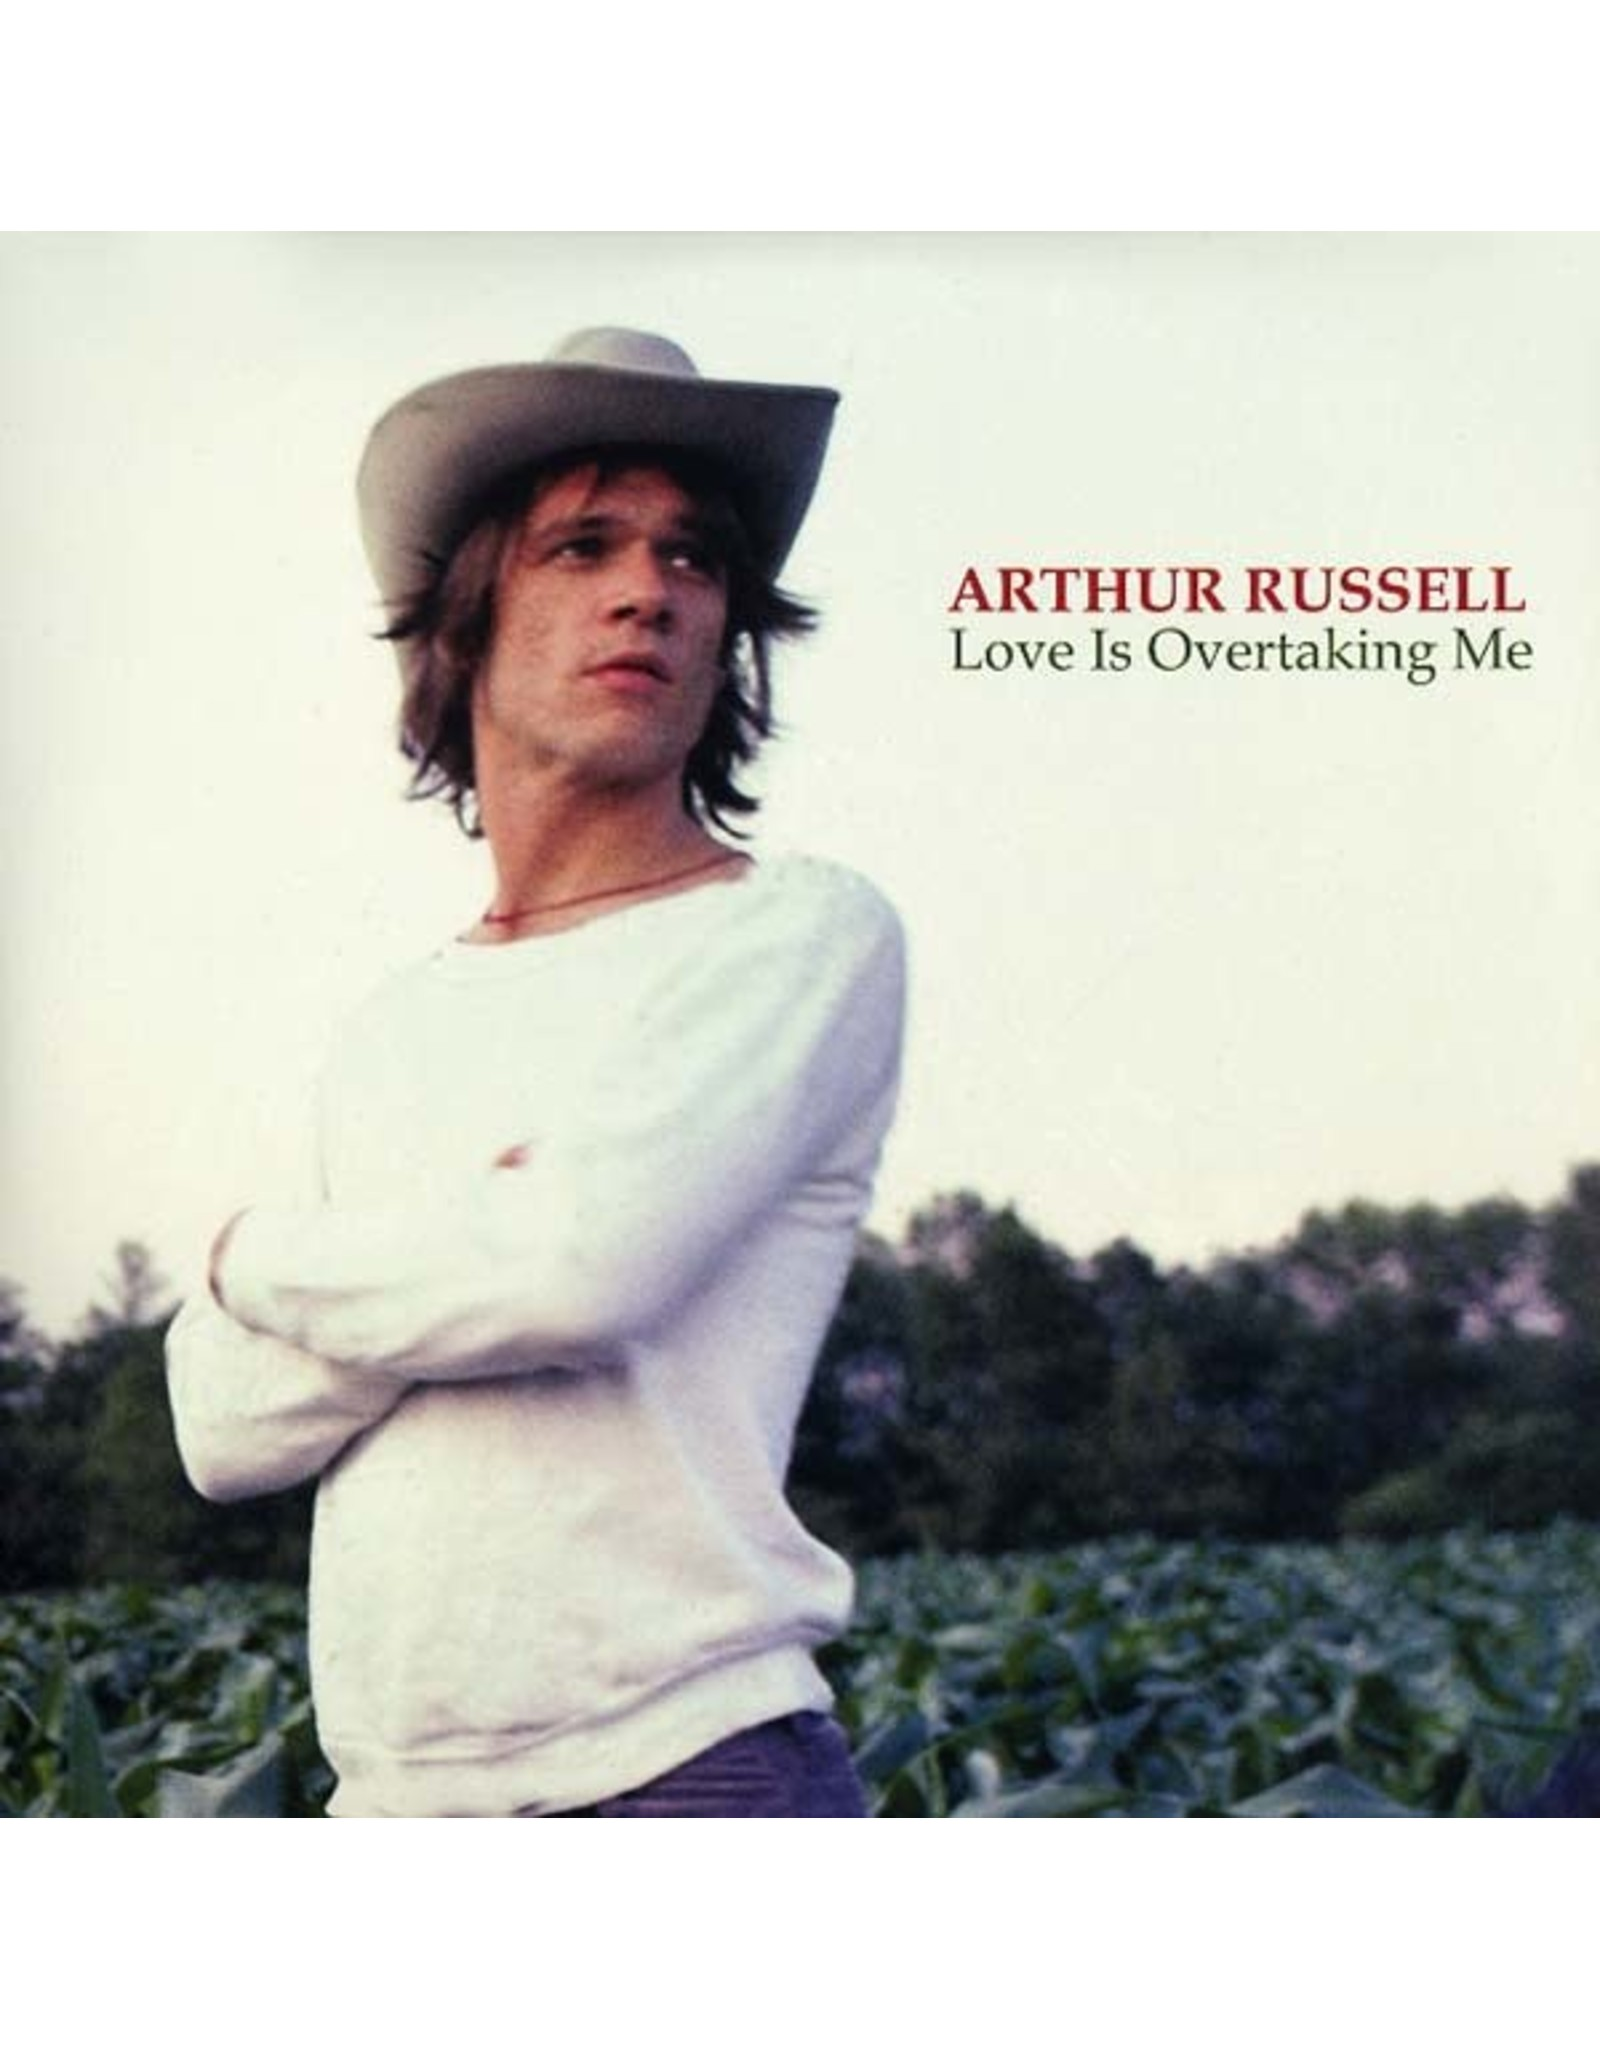 Audika Russell, Arthur: Love is Overtaking Me LP